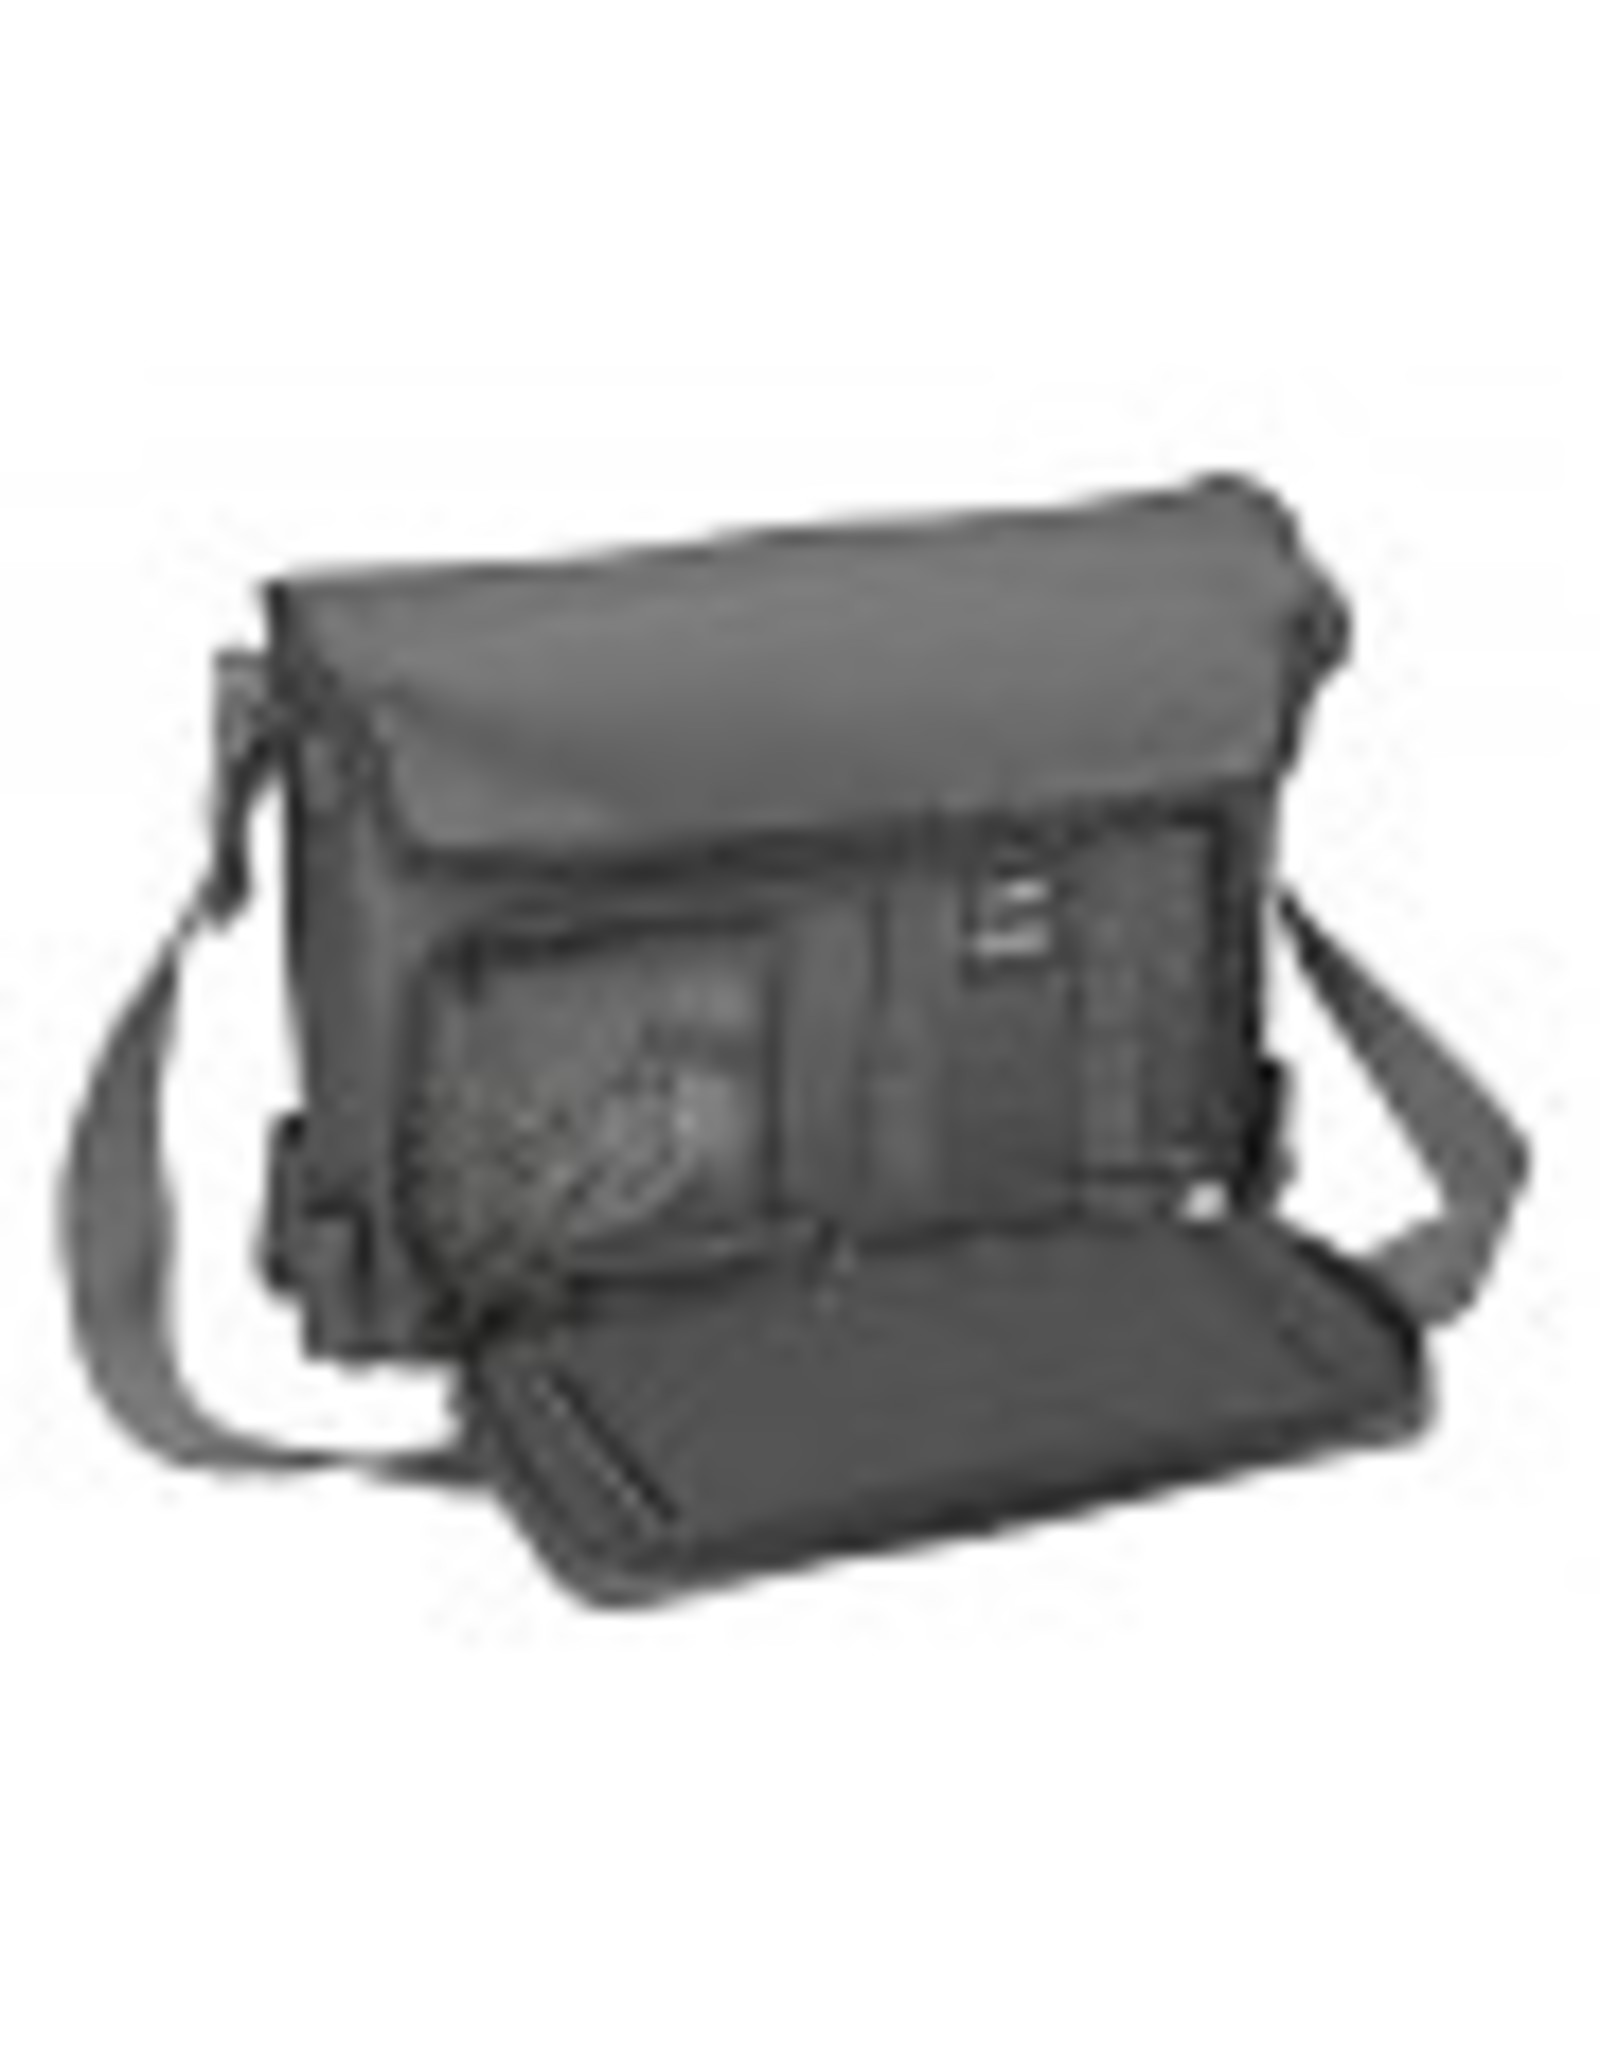 STRTG Strategy XS Side Bag